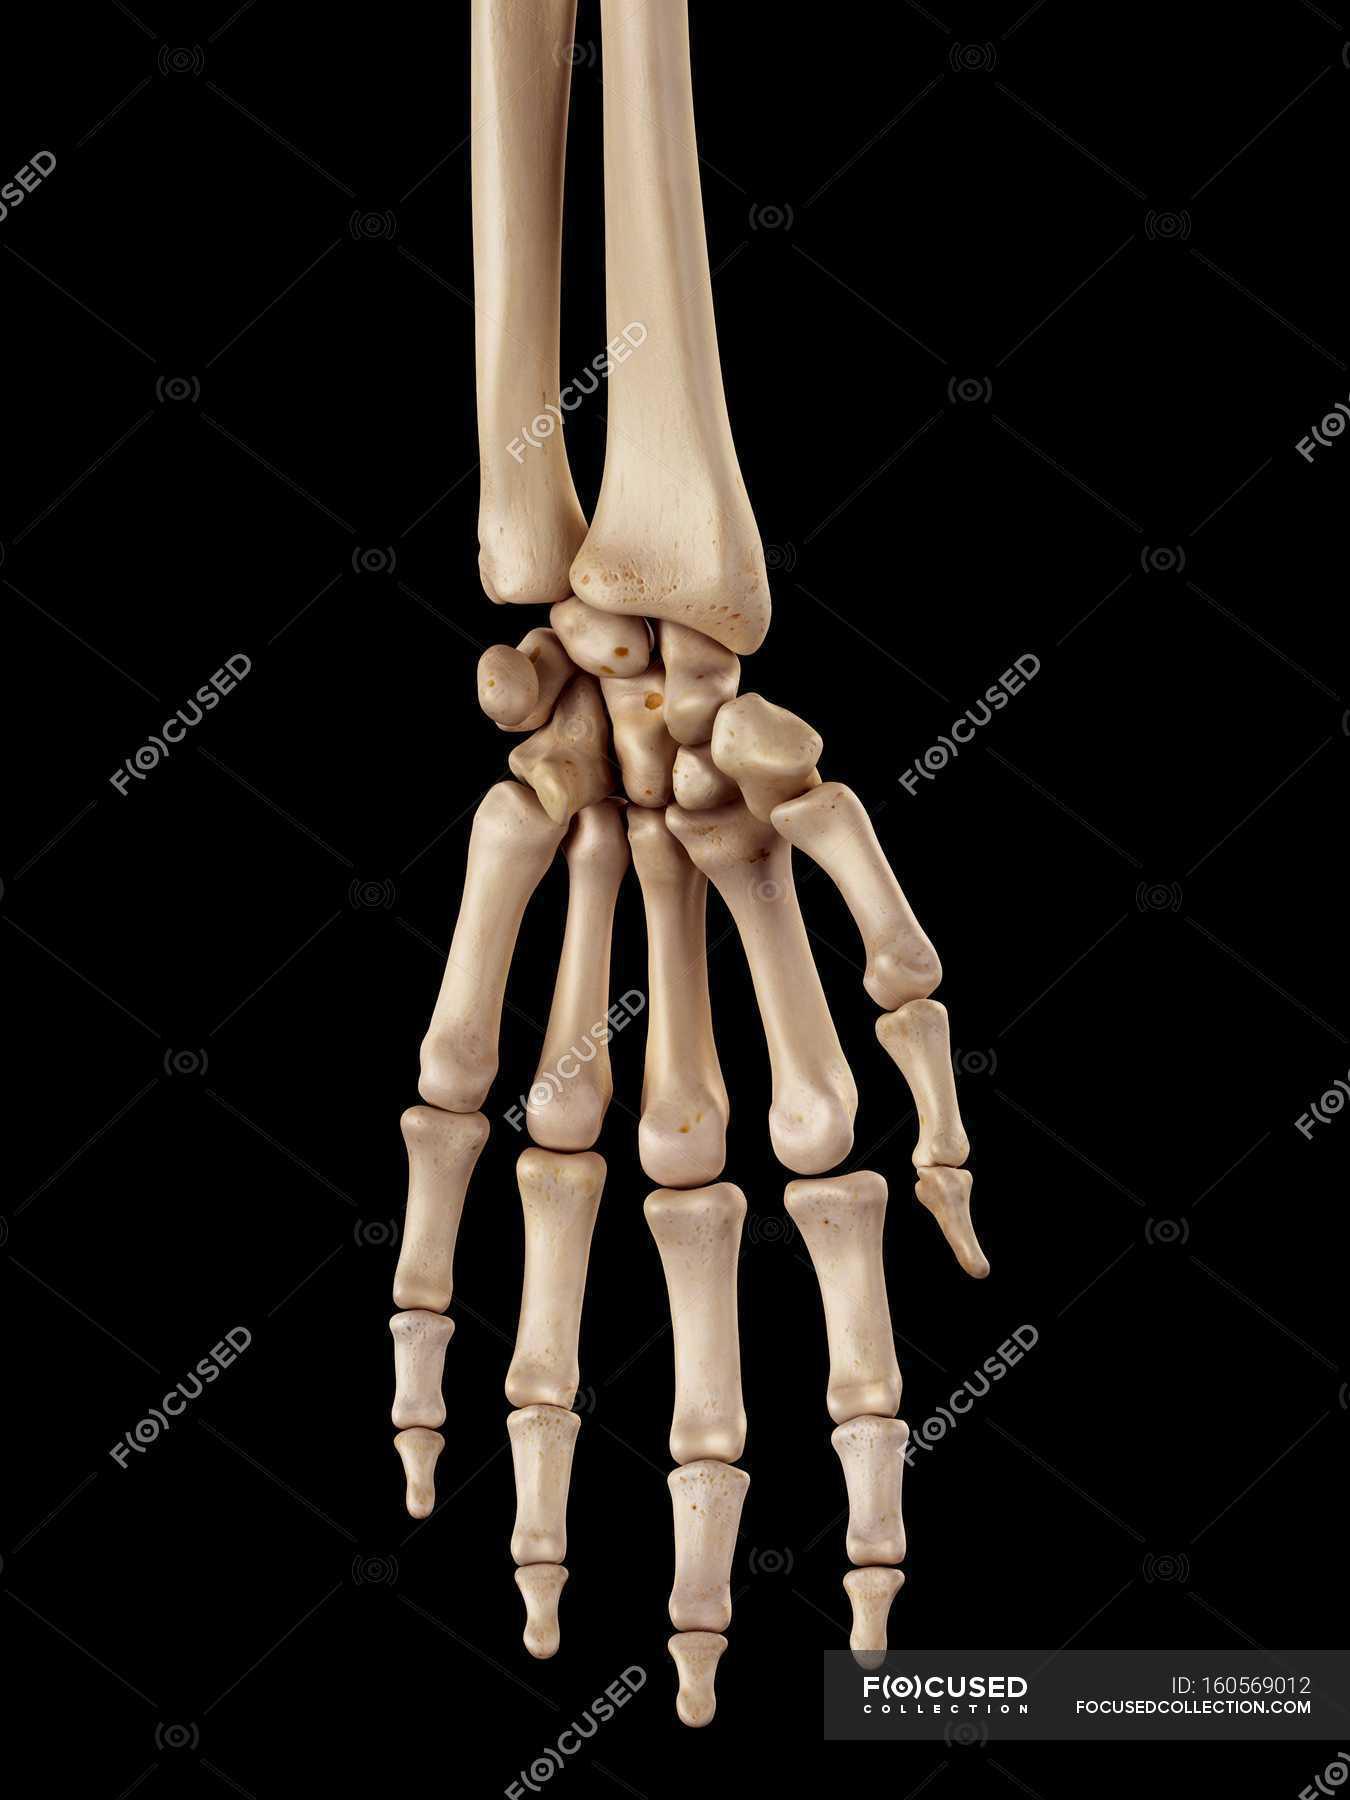 Human hand bones anatomy — Stock Photo | #160569012